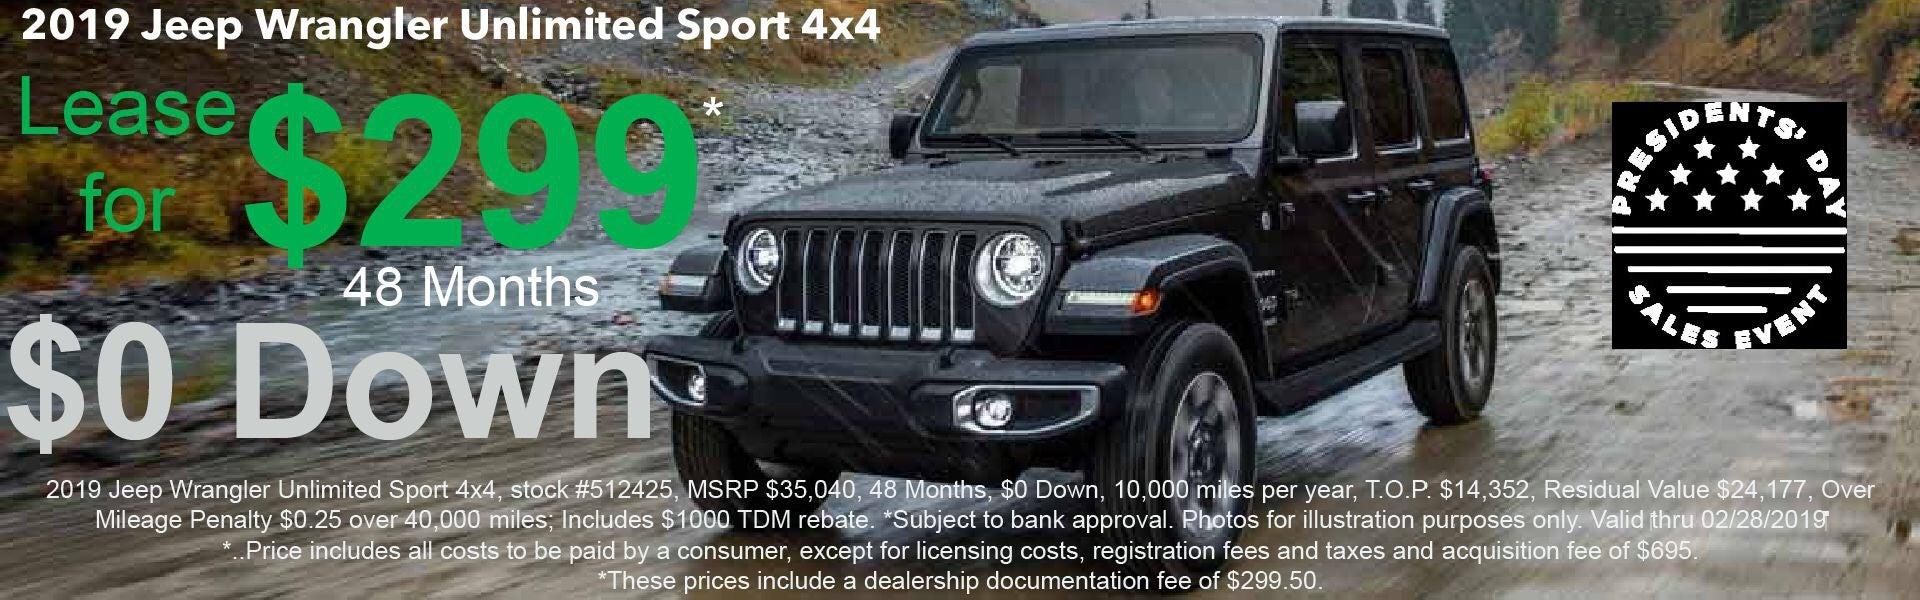 Jeep Customer Service >> Woodbury Heights Chrysler Jeep Dealer In Woodbury Heights Nj